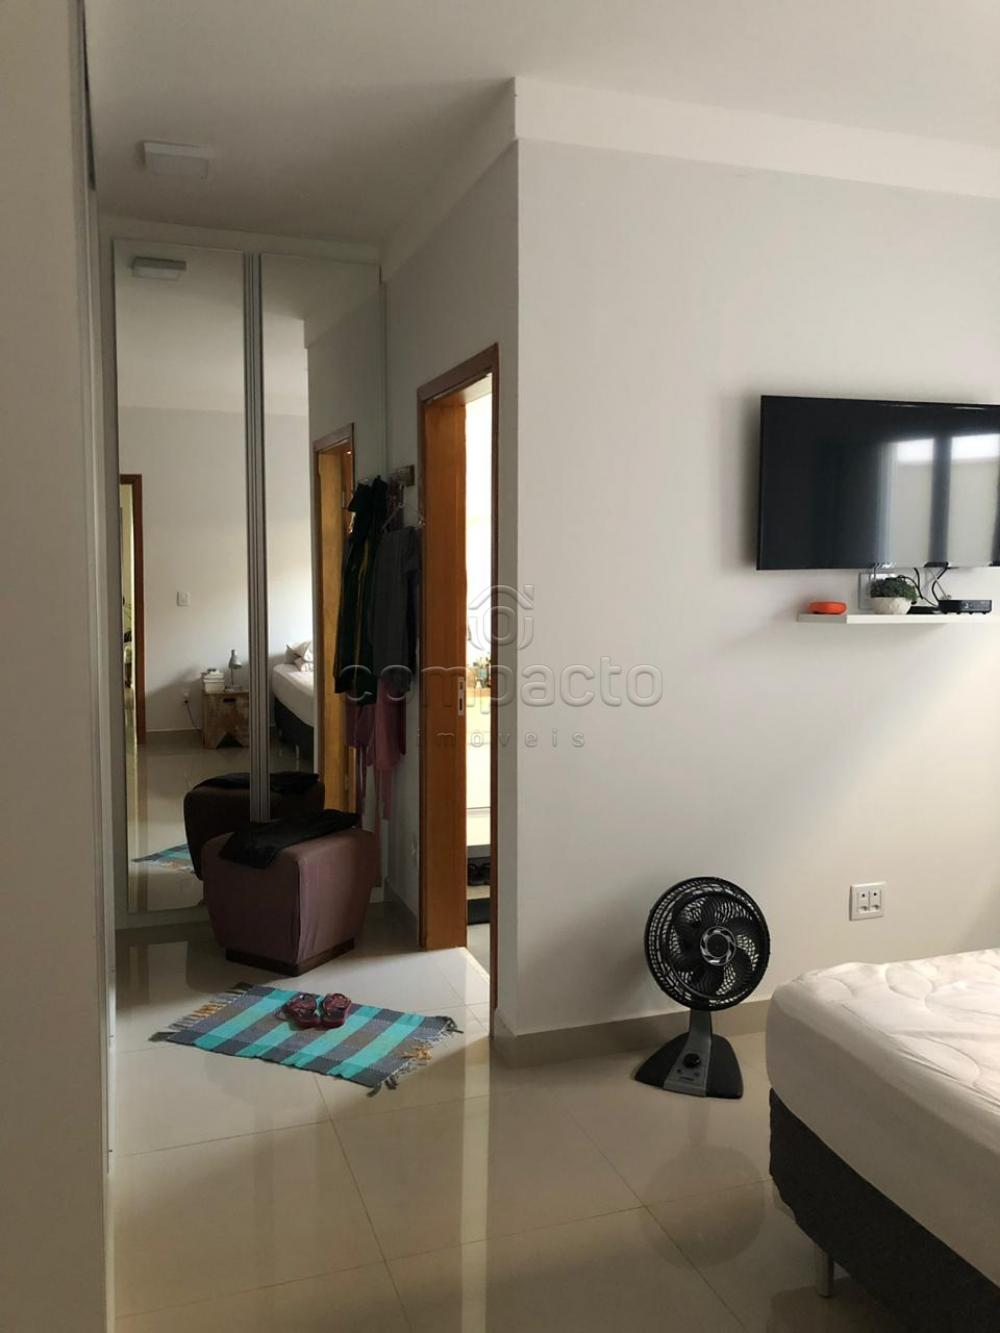 Comprar Casa / Condomínio em Bauru apenas R$ 850.000,00 - Foto 10